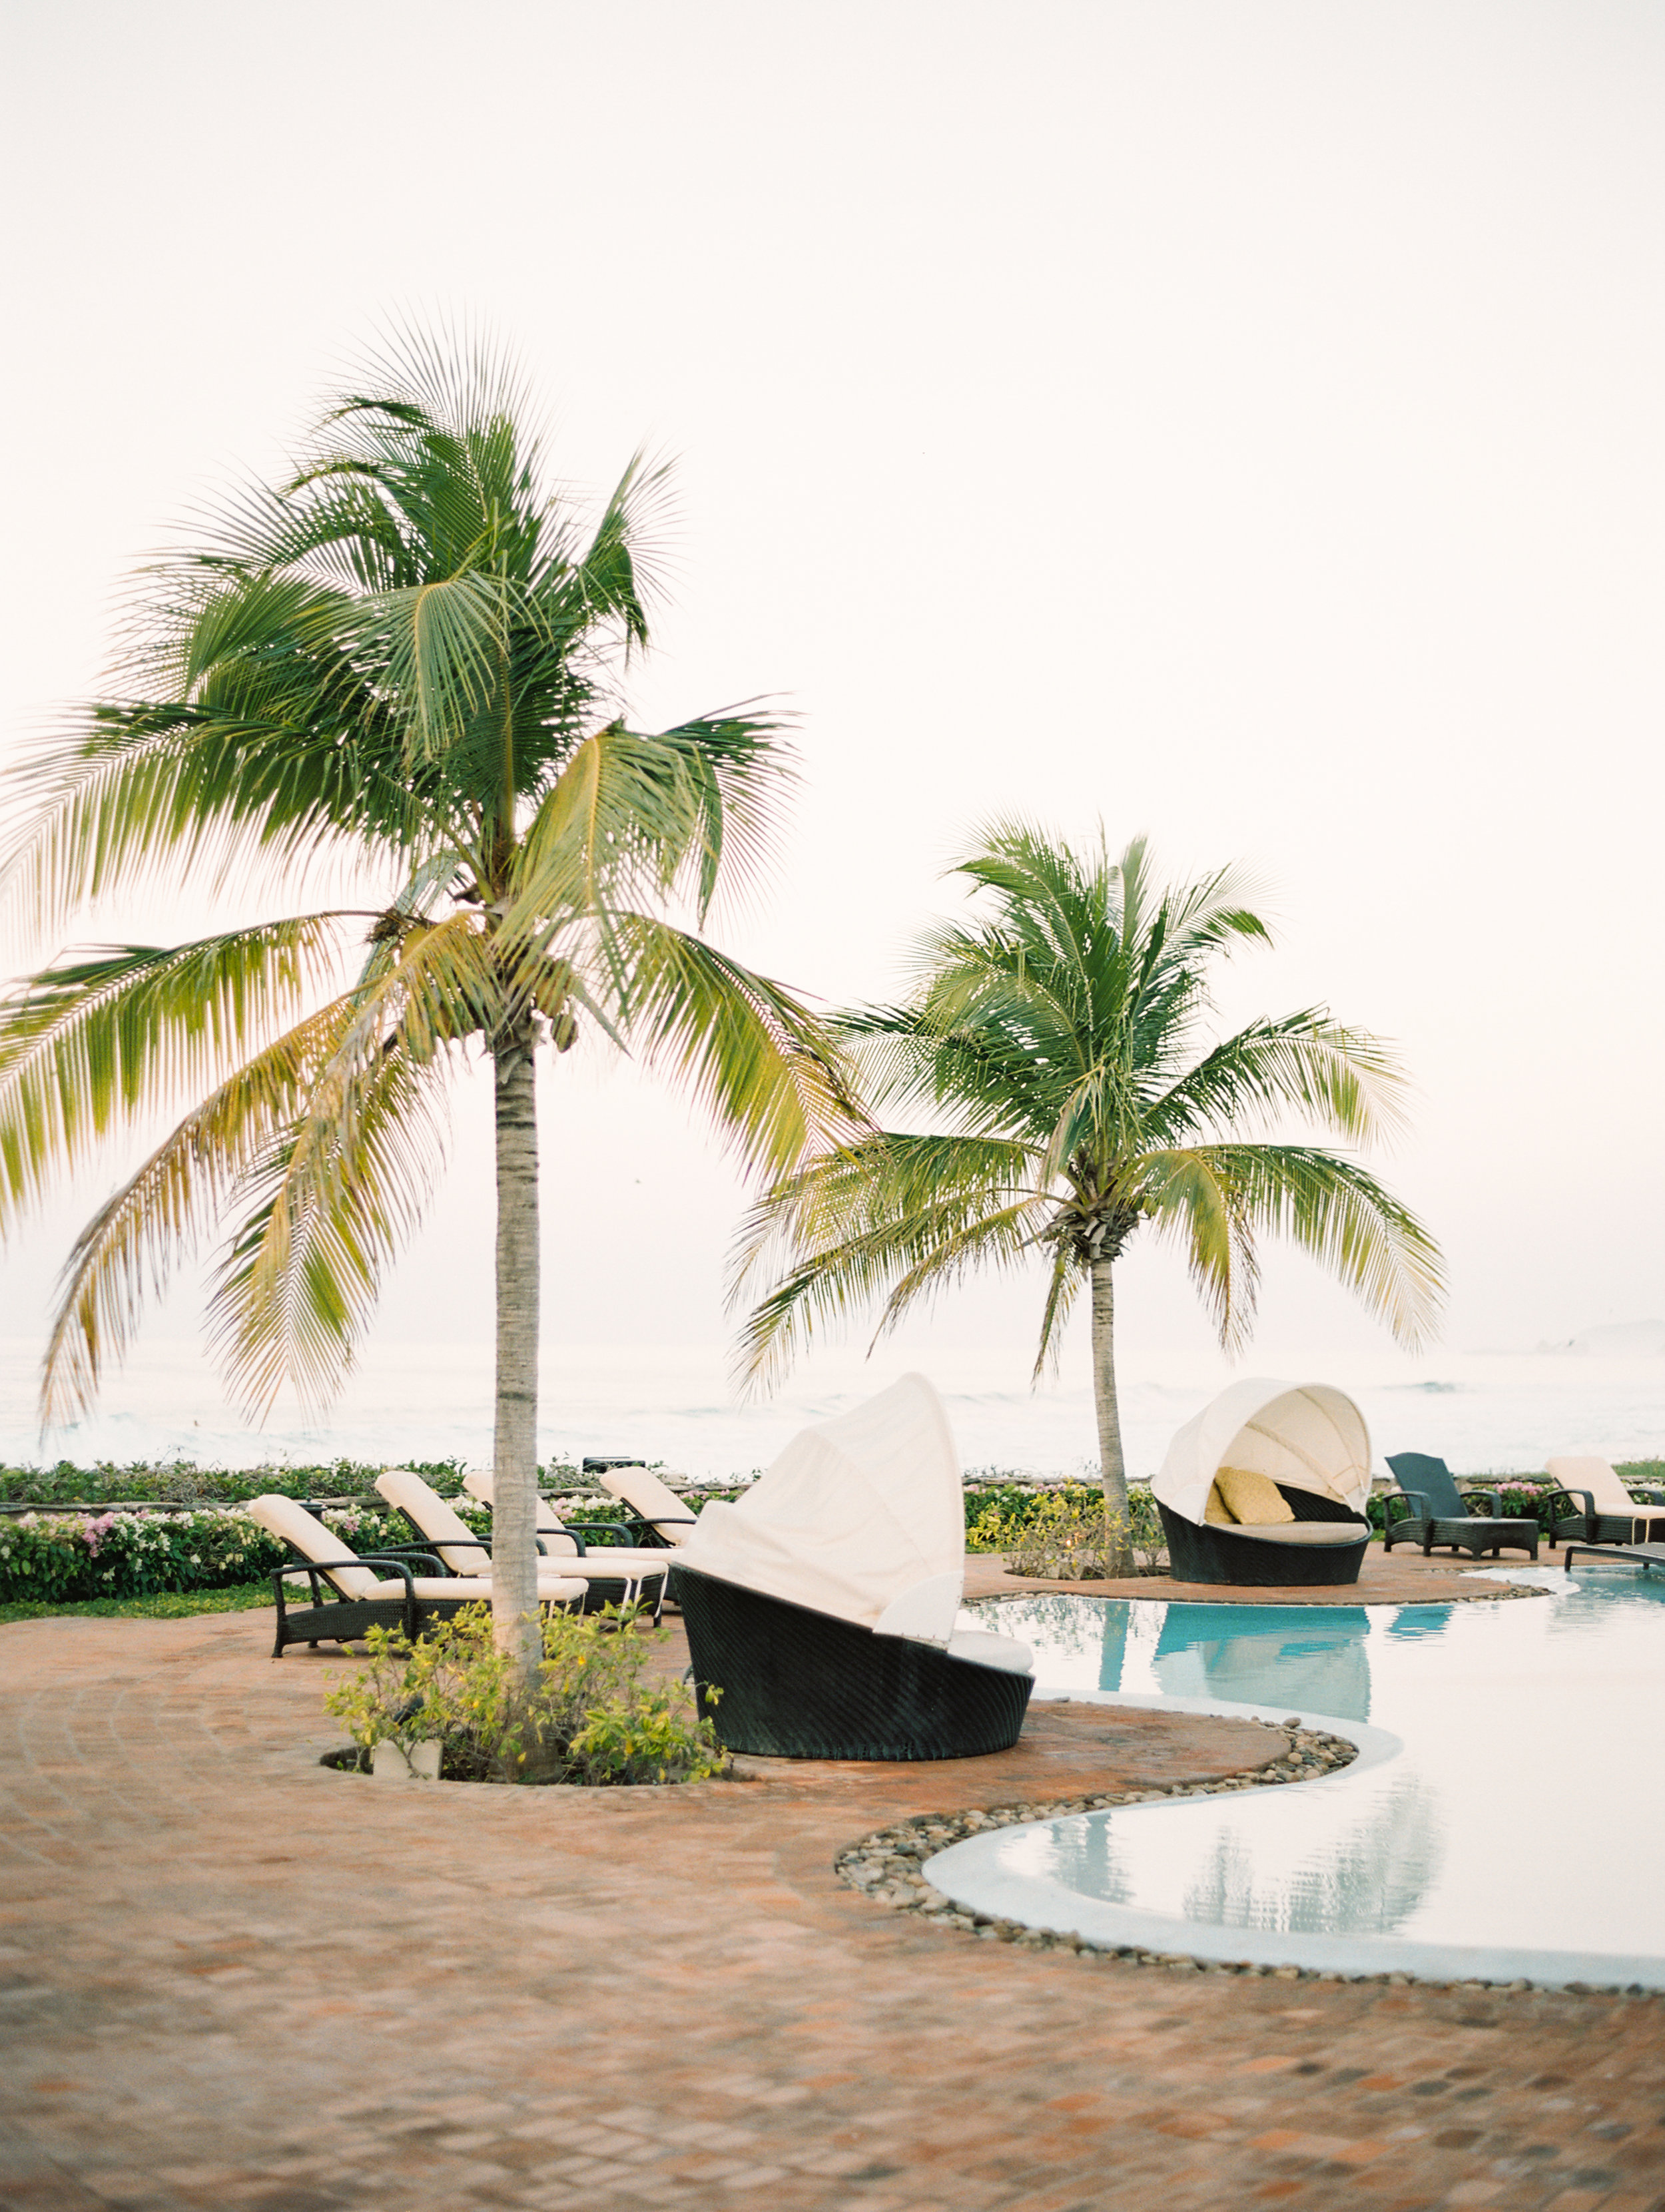 017-fine-art-film-photographer-destination-wedding-nicaragua-jacob+cammye-brumley & wells.jpg